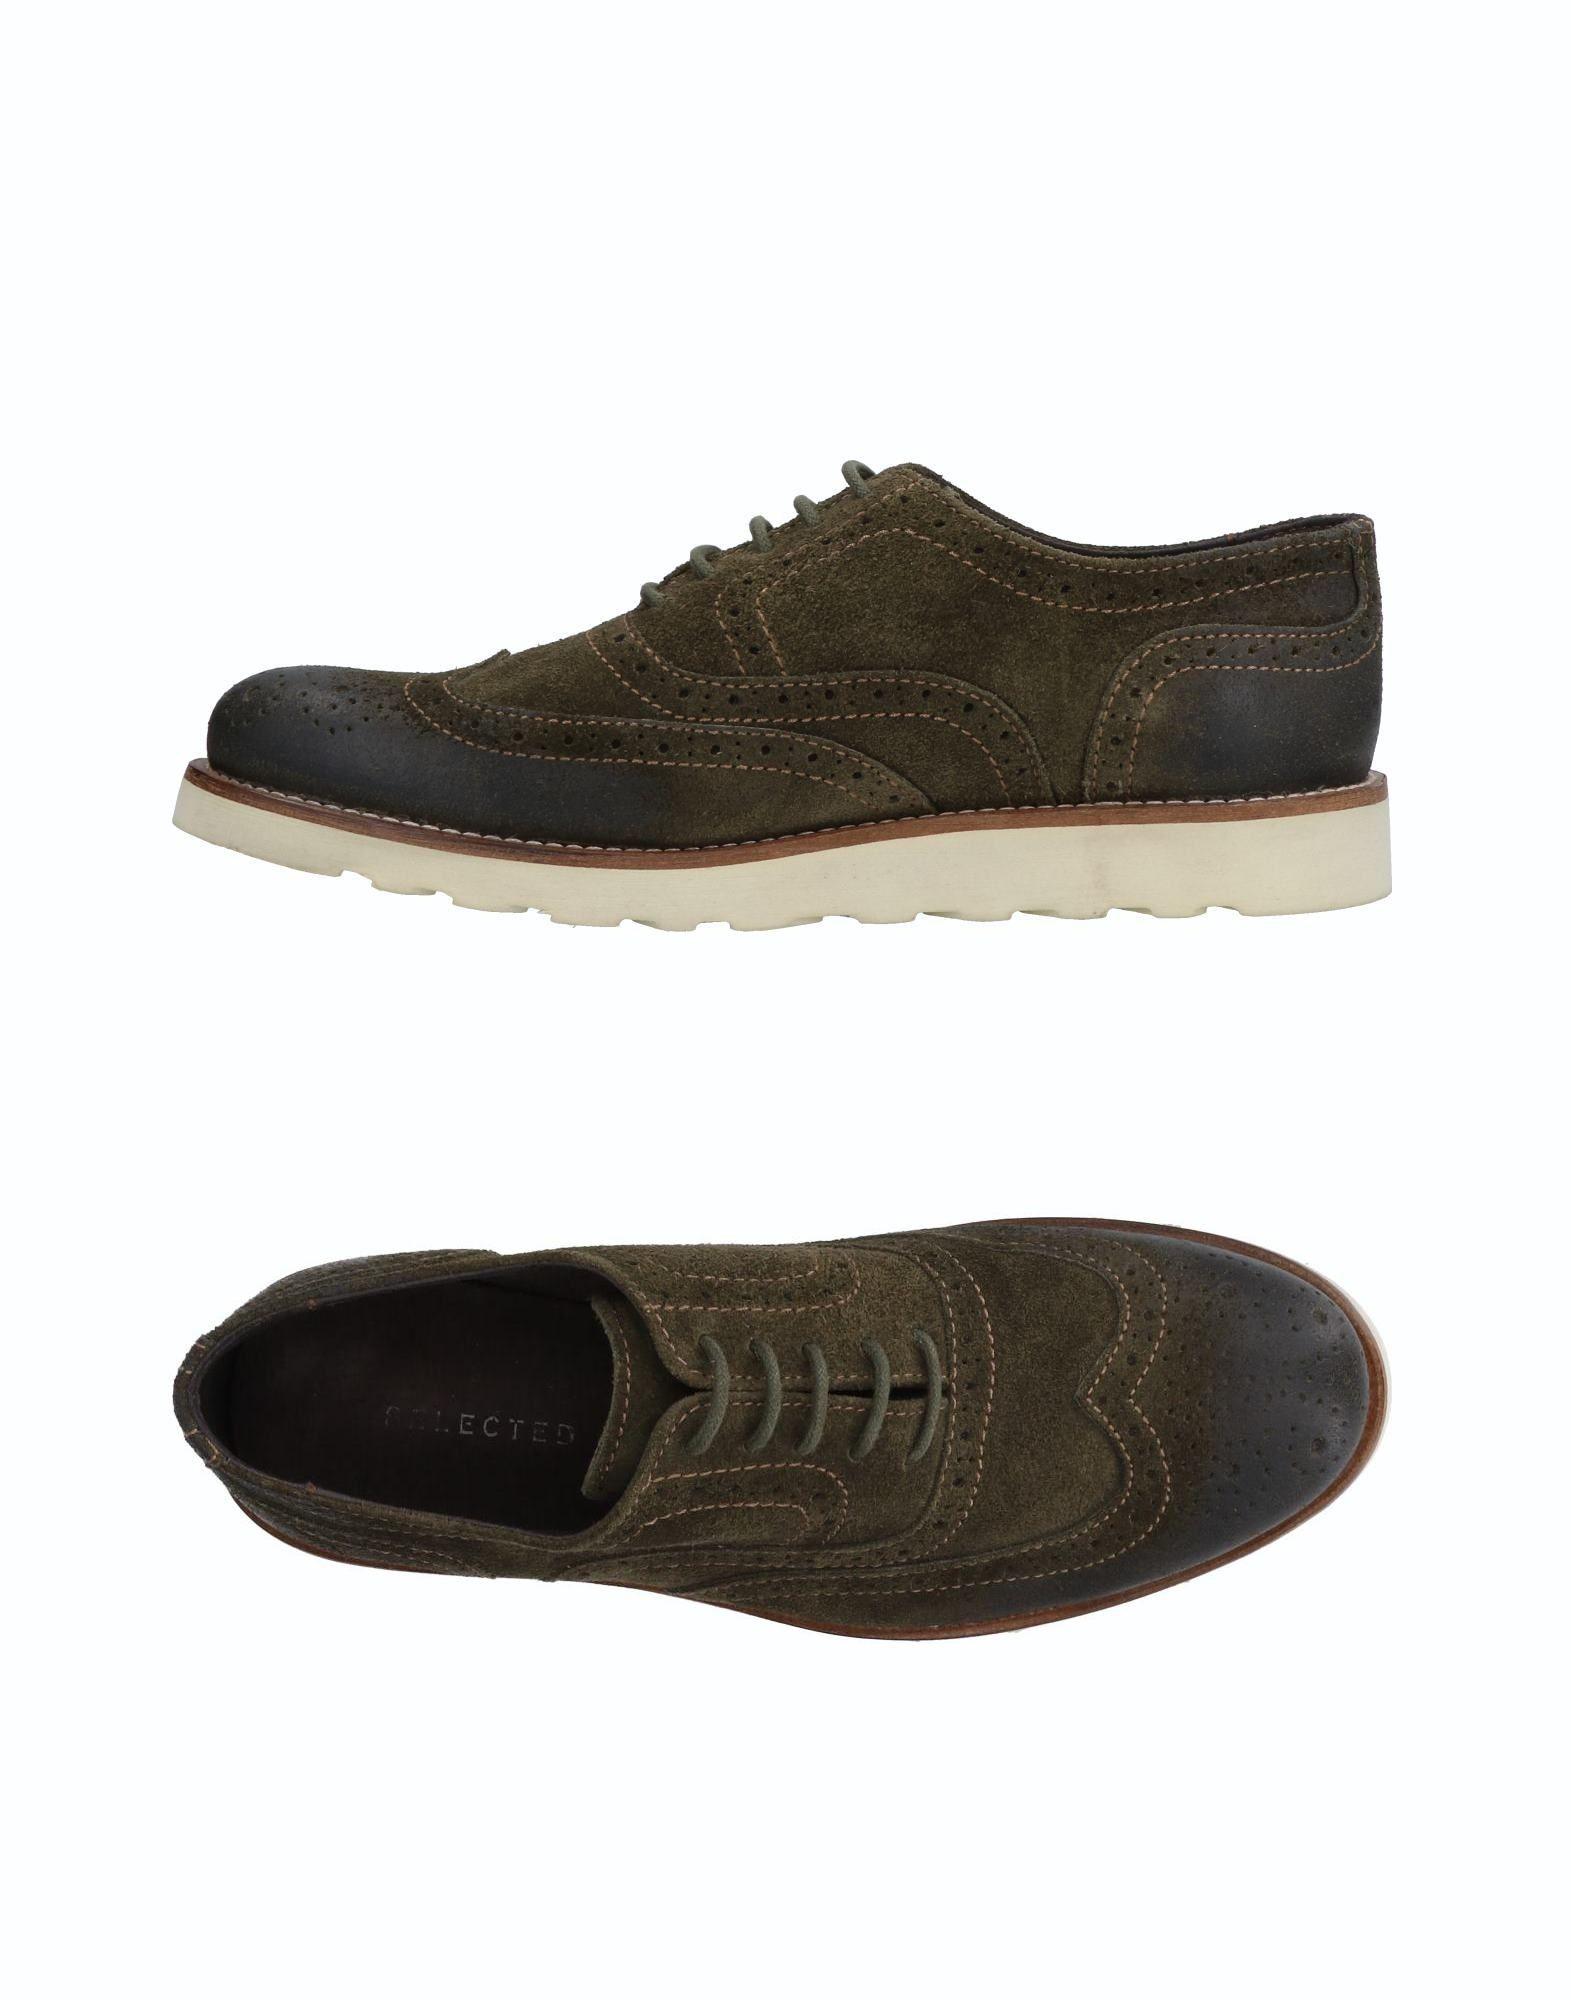 SELECTED Обувь на шнурках selected homme обувь на шнурках